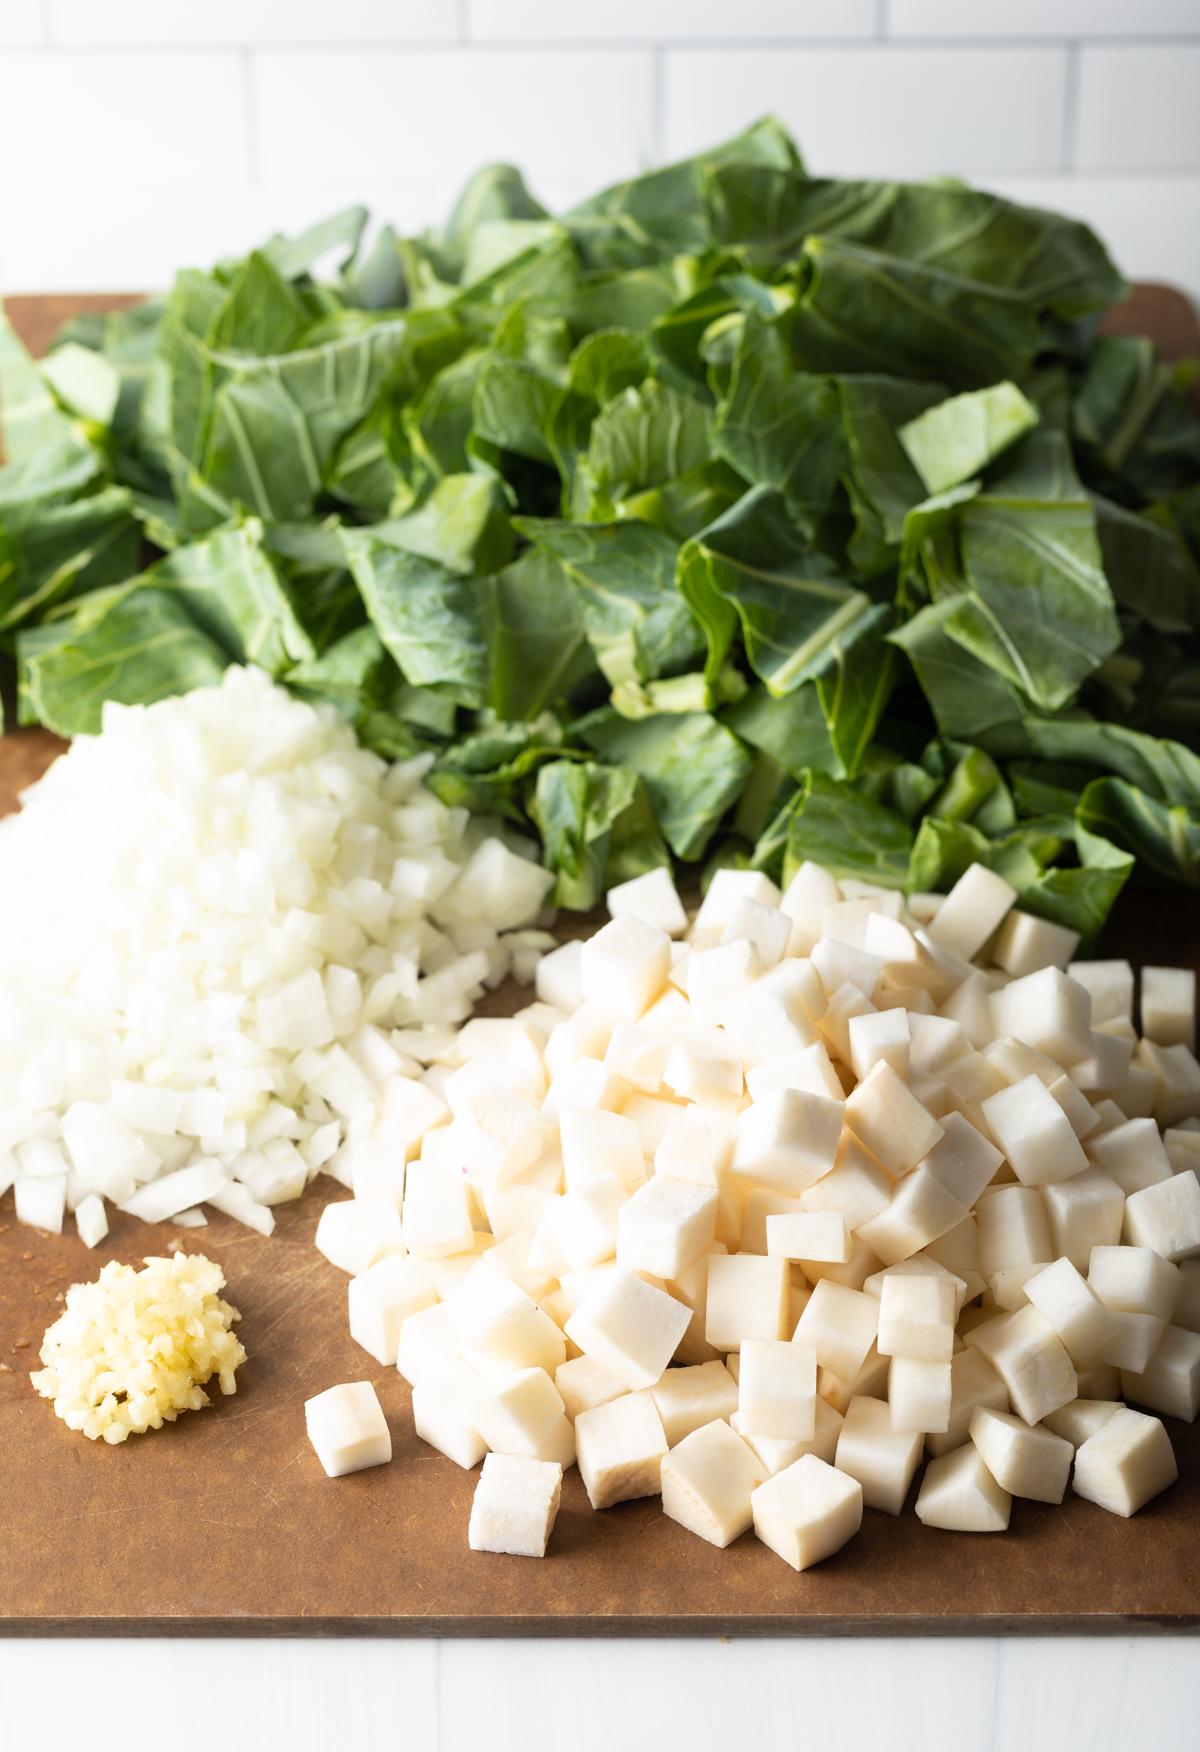 collard greens ingredients